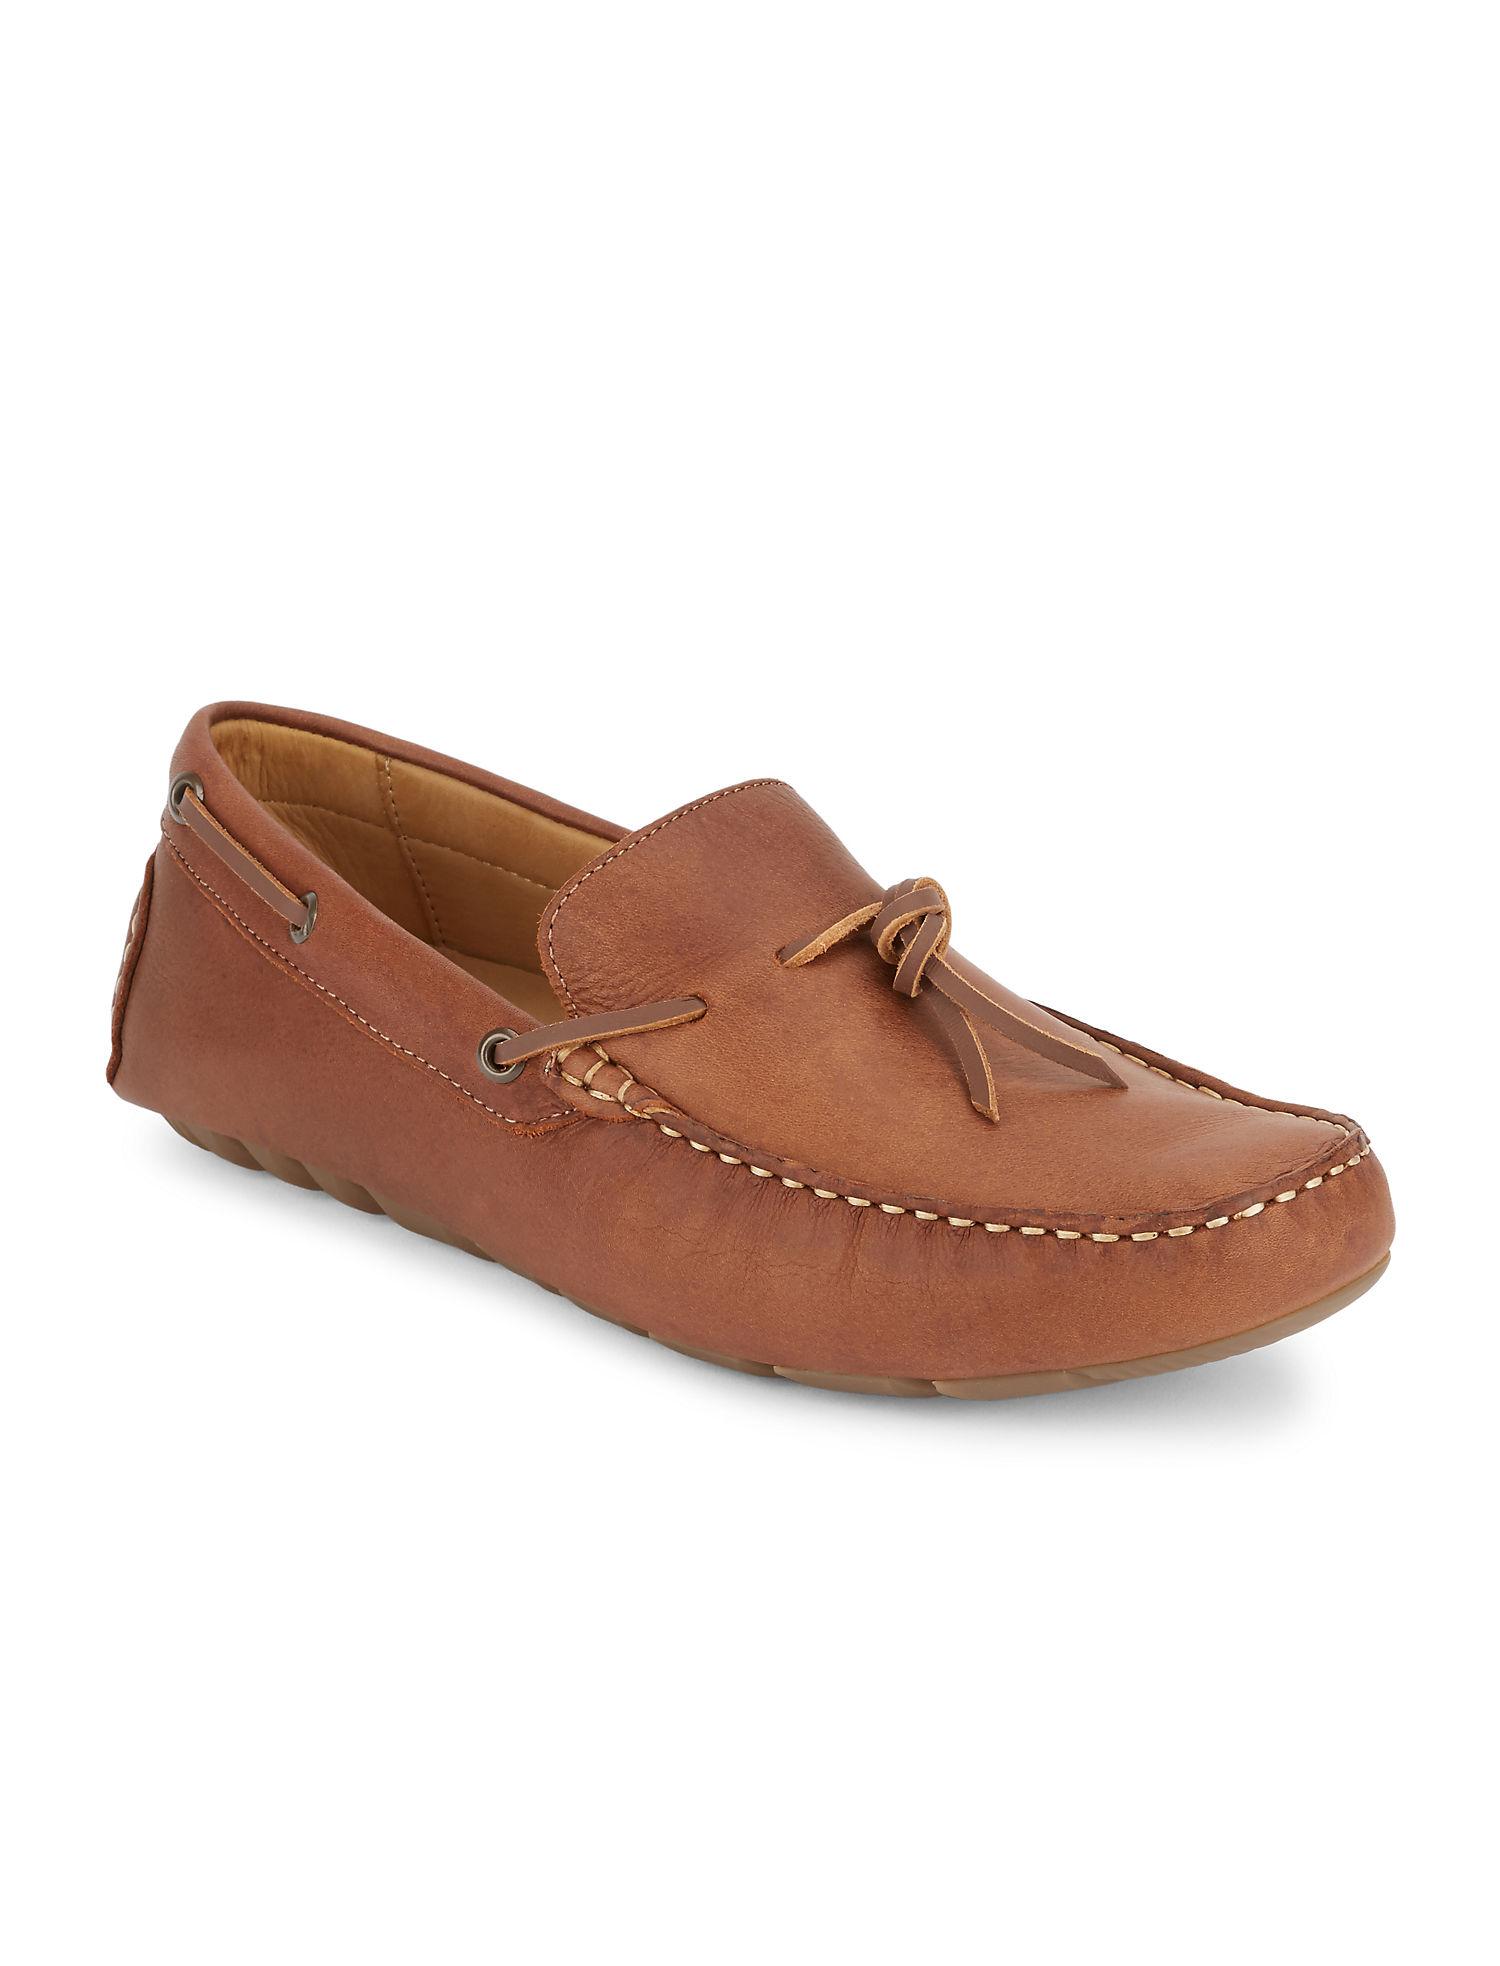 LUCKY BRAND FOOTWEAR Wagner Shoe FdB7I